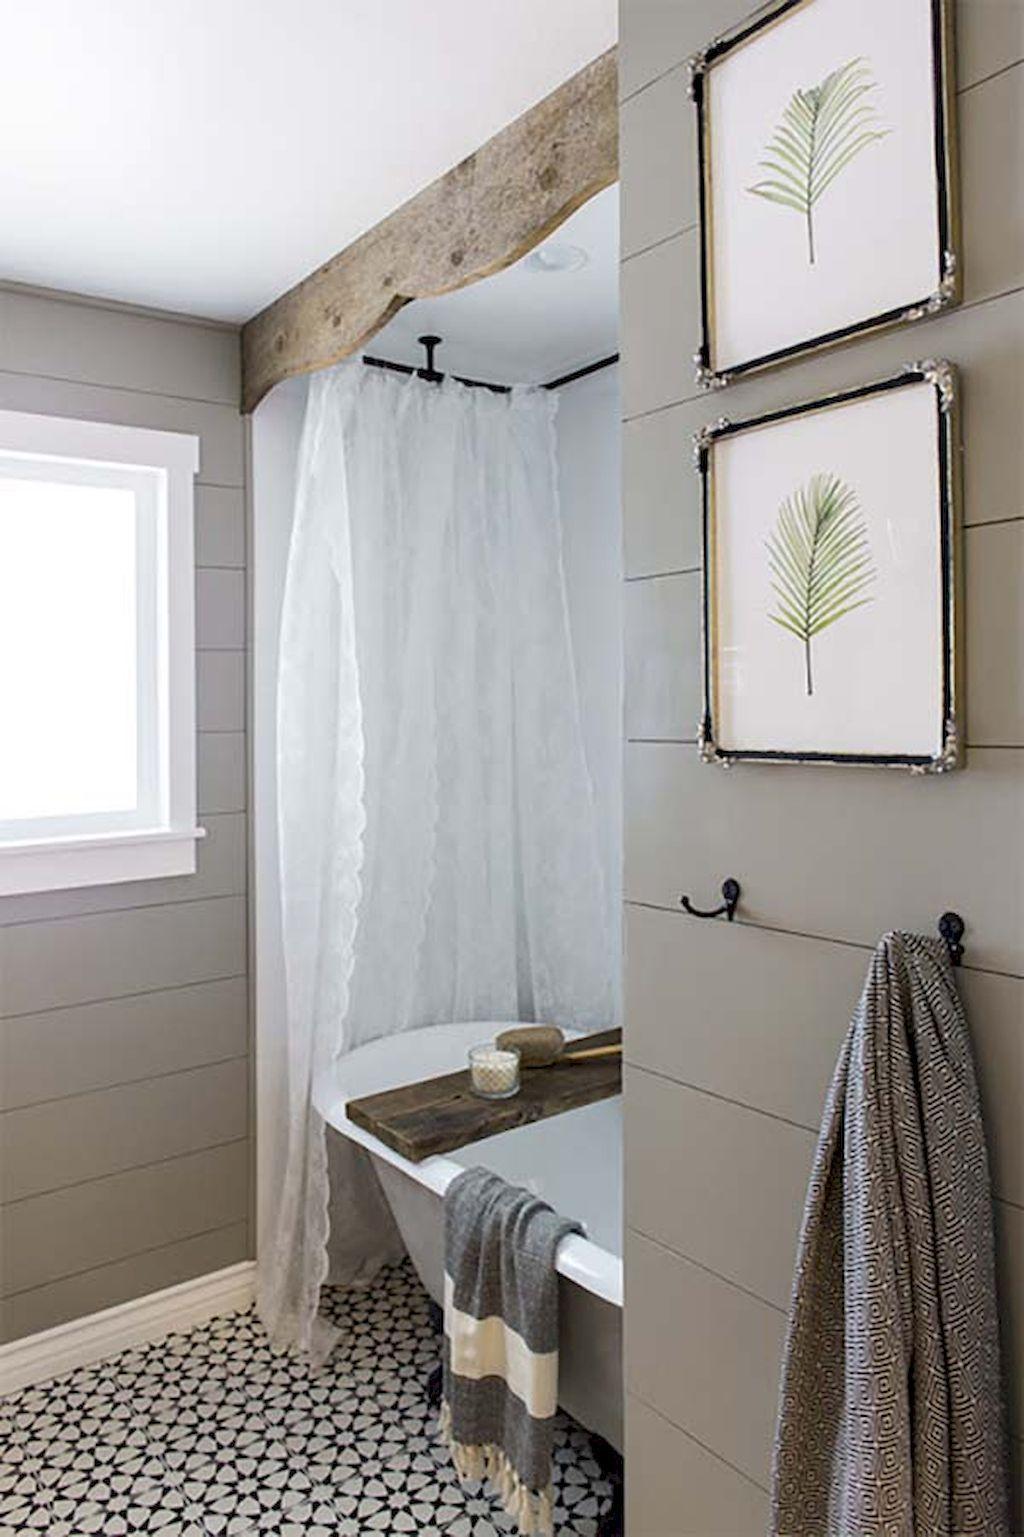 Vintage farmhouse bathroom remodel ideas on a budget (55 ...